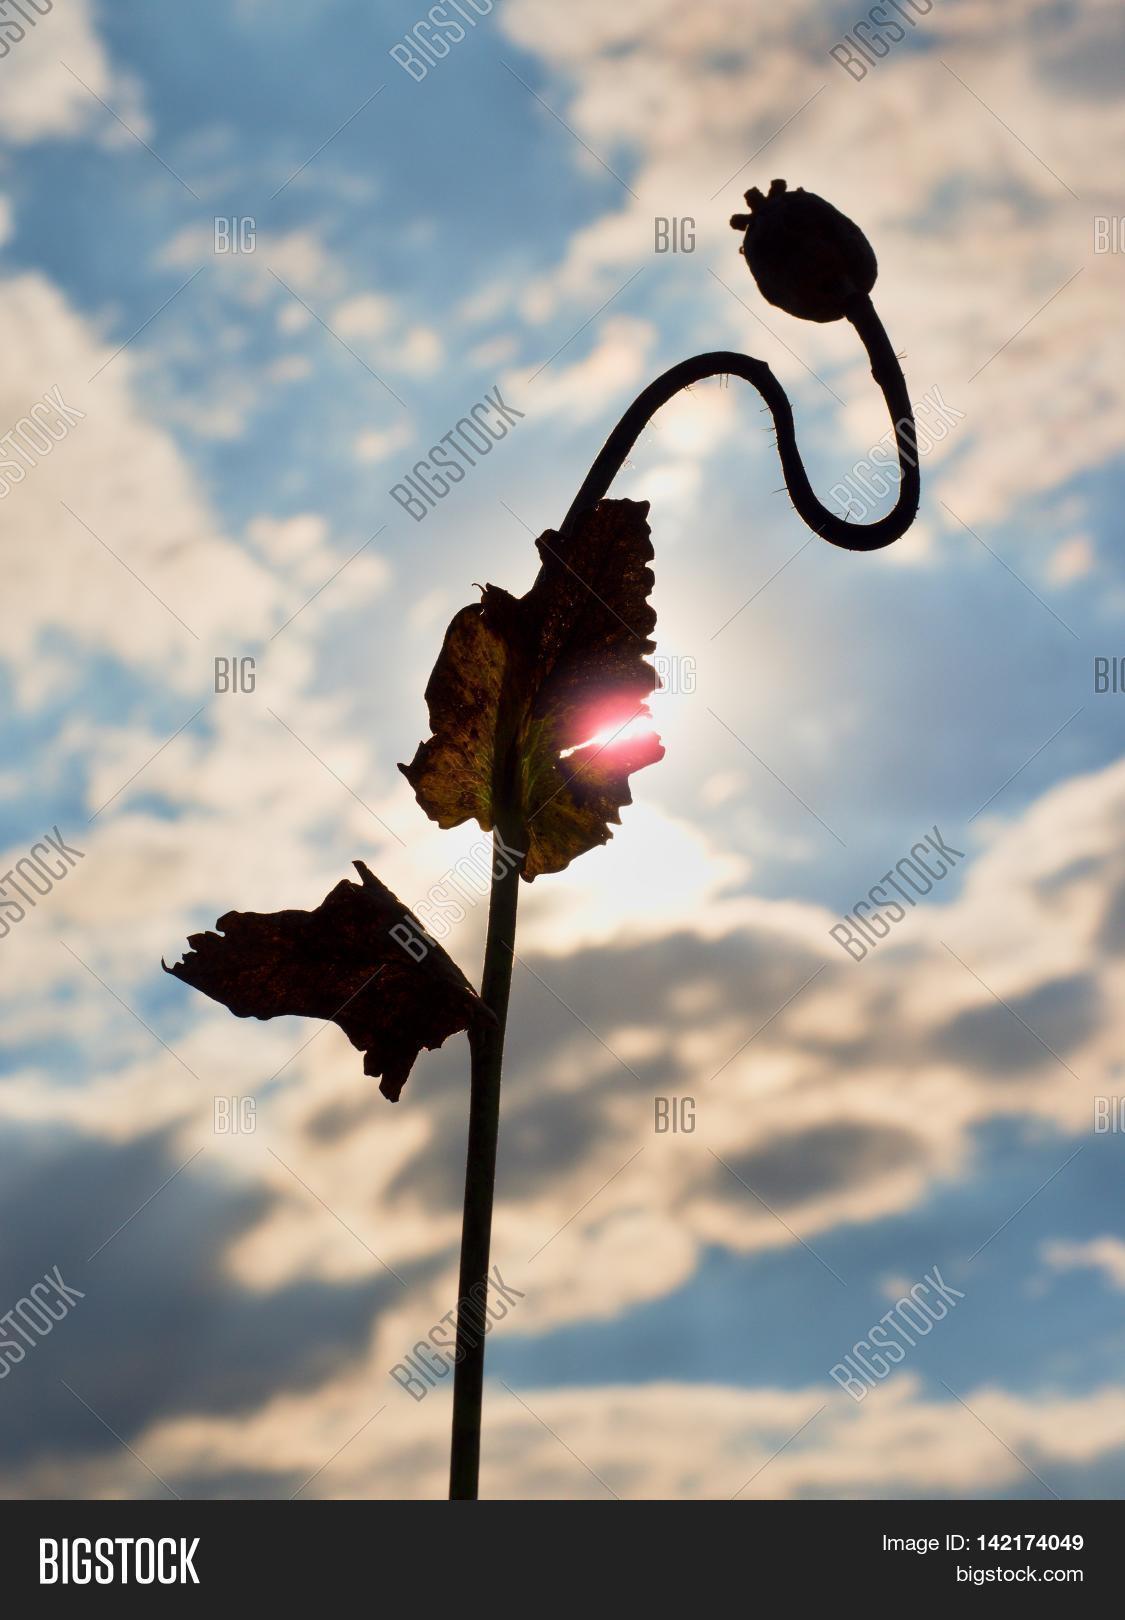 Long Dry Stalk Poppy Image Photo Free Trial Bigstock